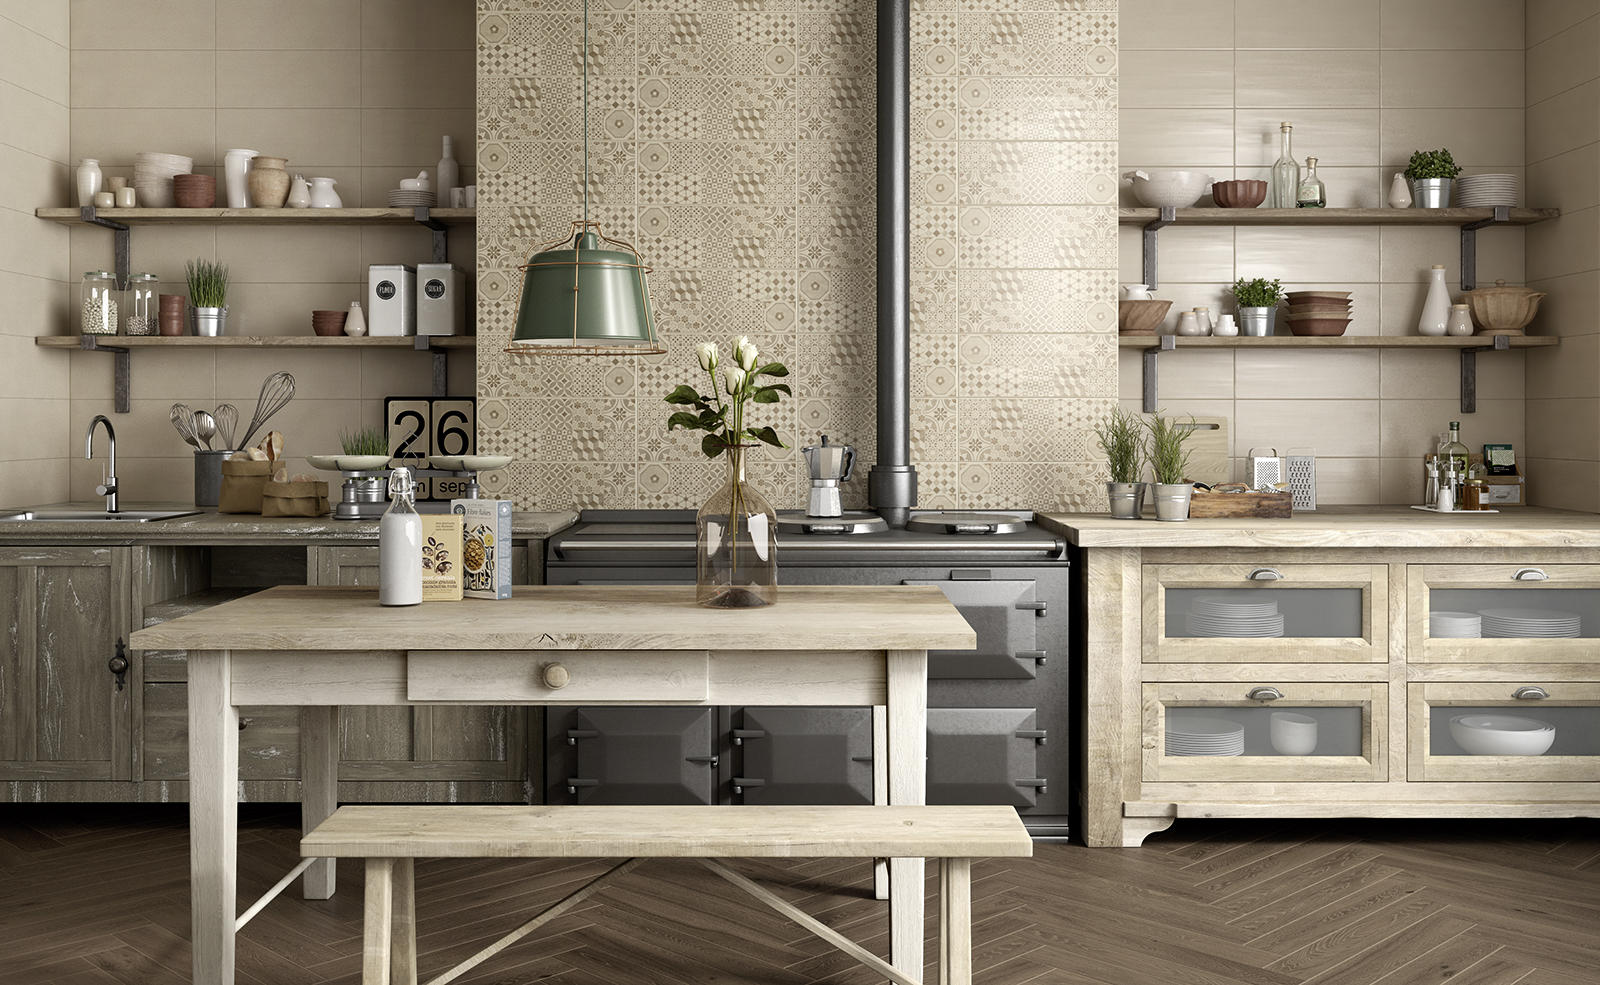 Paint rivestimento bagno e cucina marazzi - Rivestimenti cucina marazzi ...